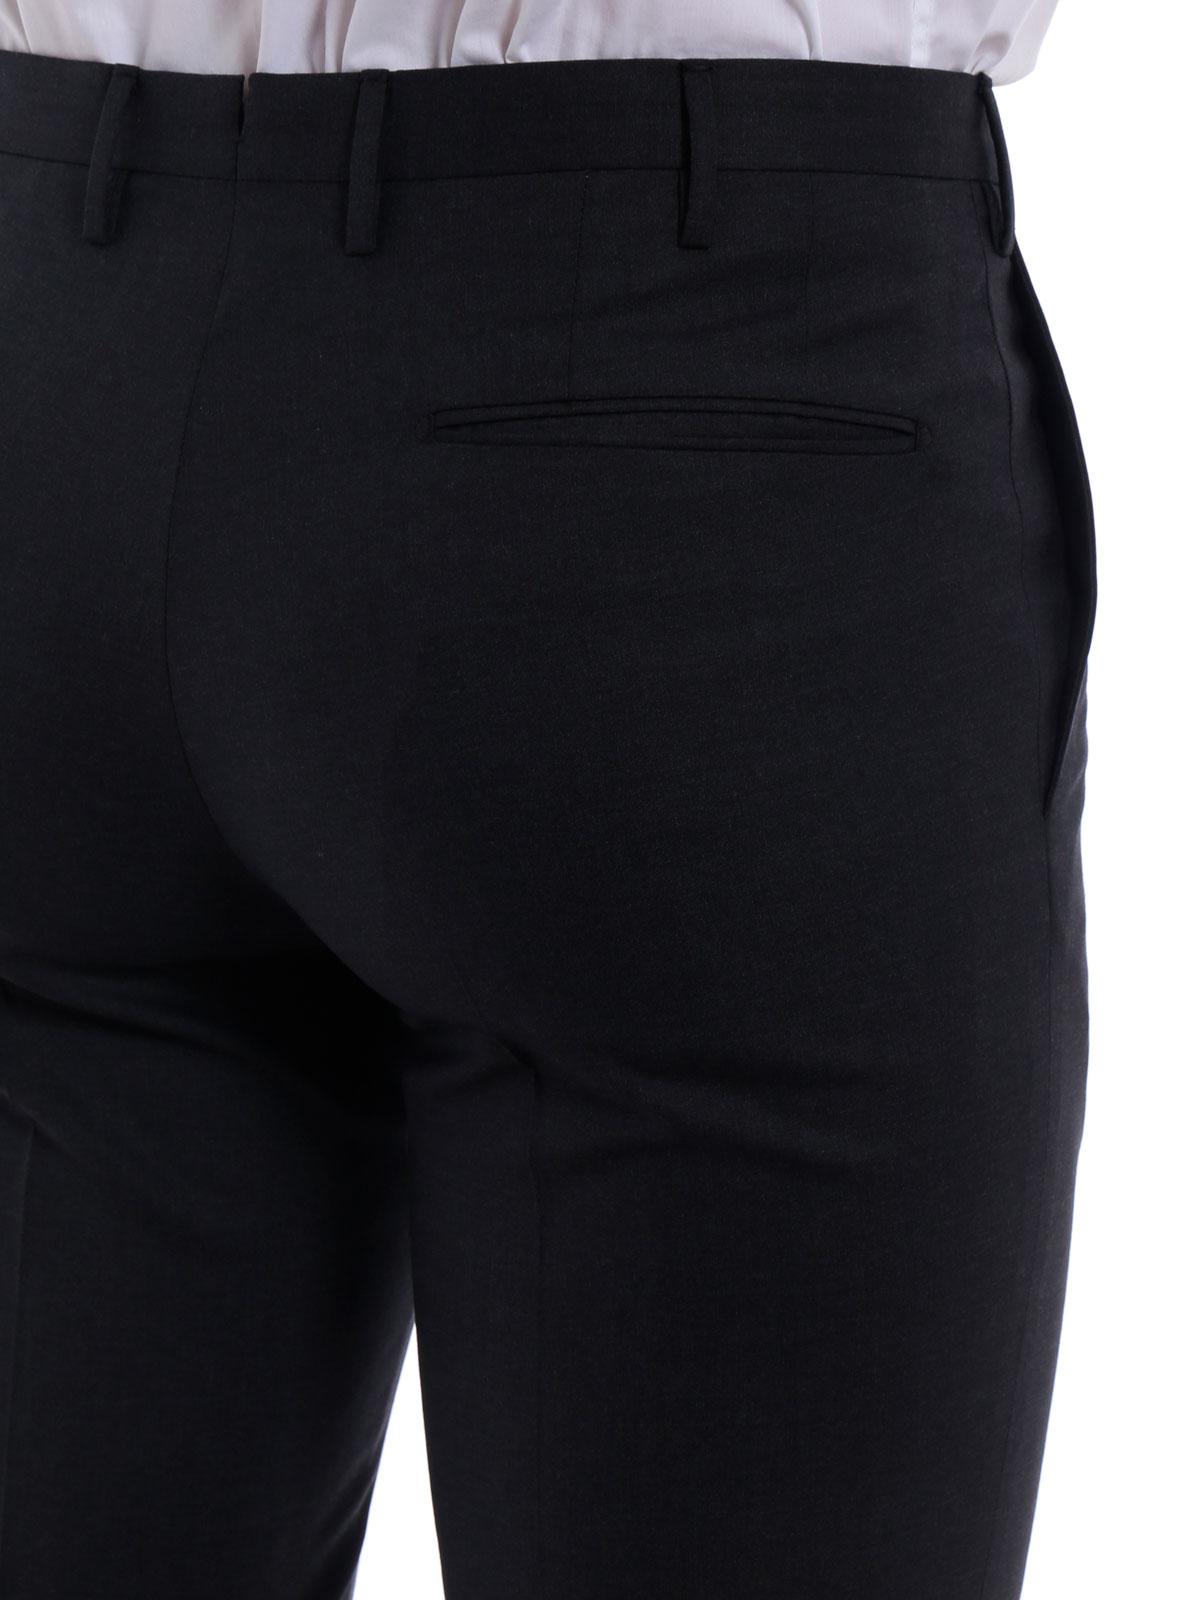 Immagine di INCOTEX | Pantaloni Uomo Lana